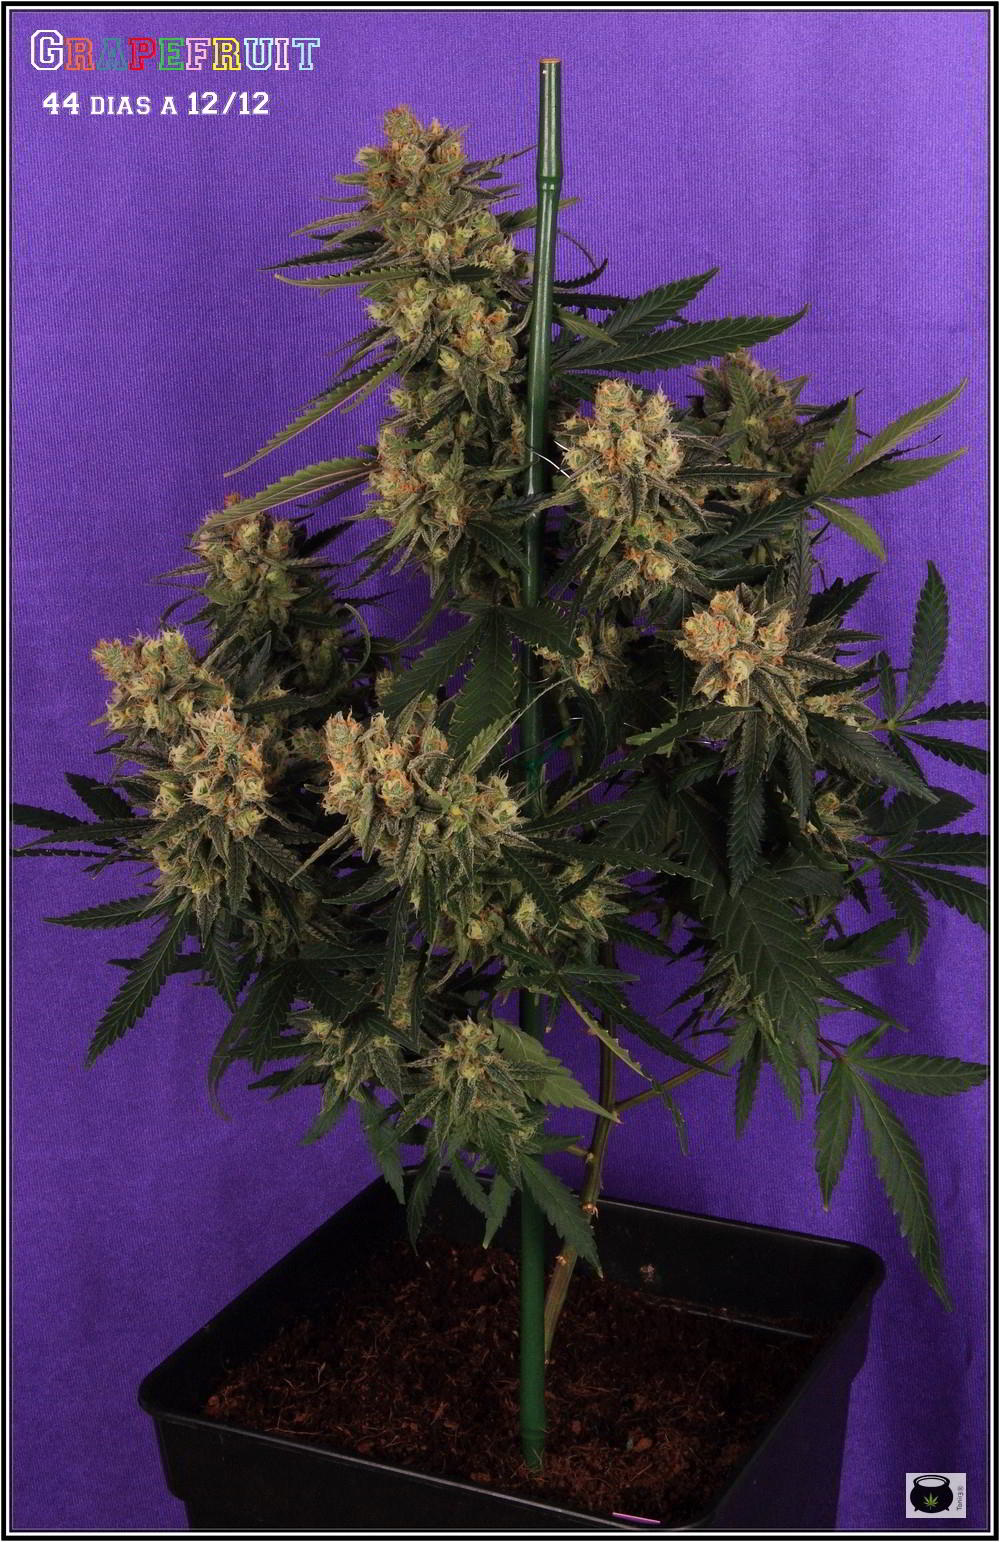 36- Variedad de marihuana Grapefruit 44 días a 12/12 1